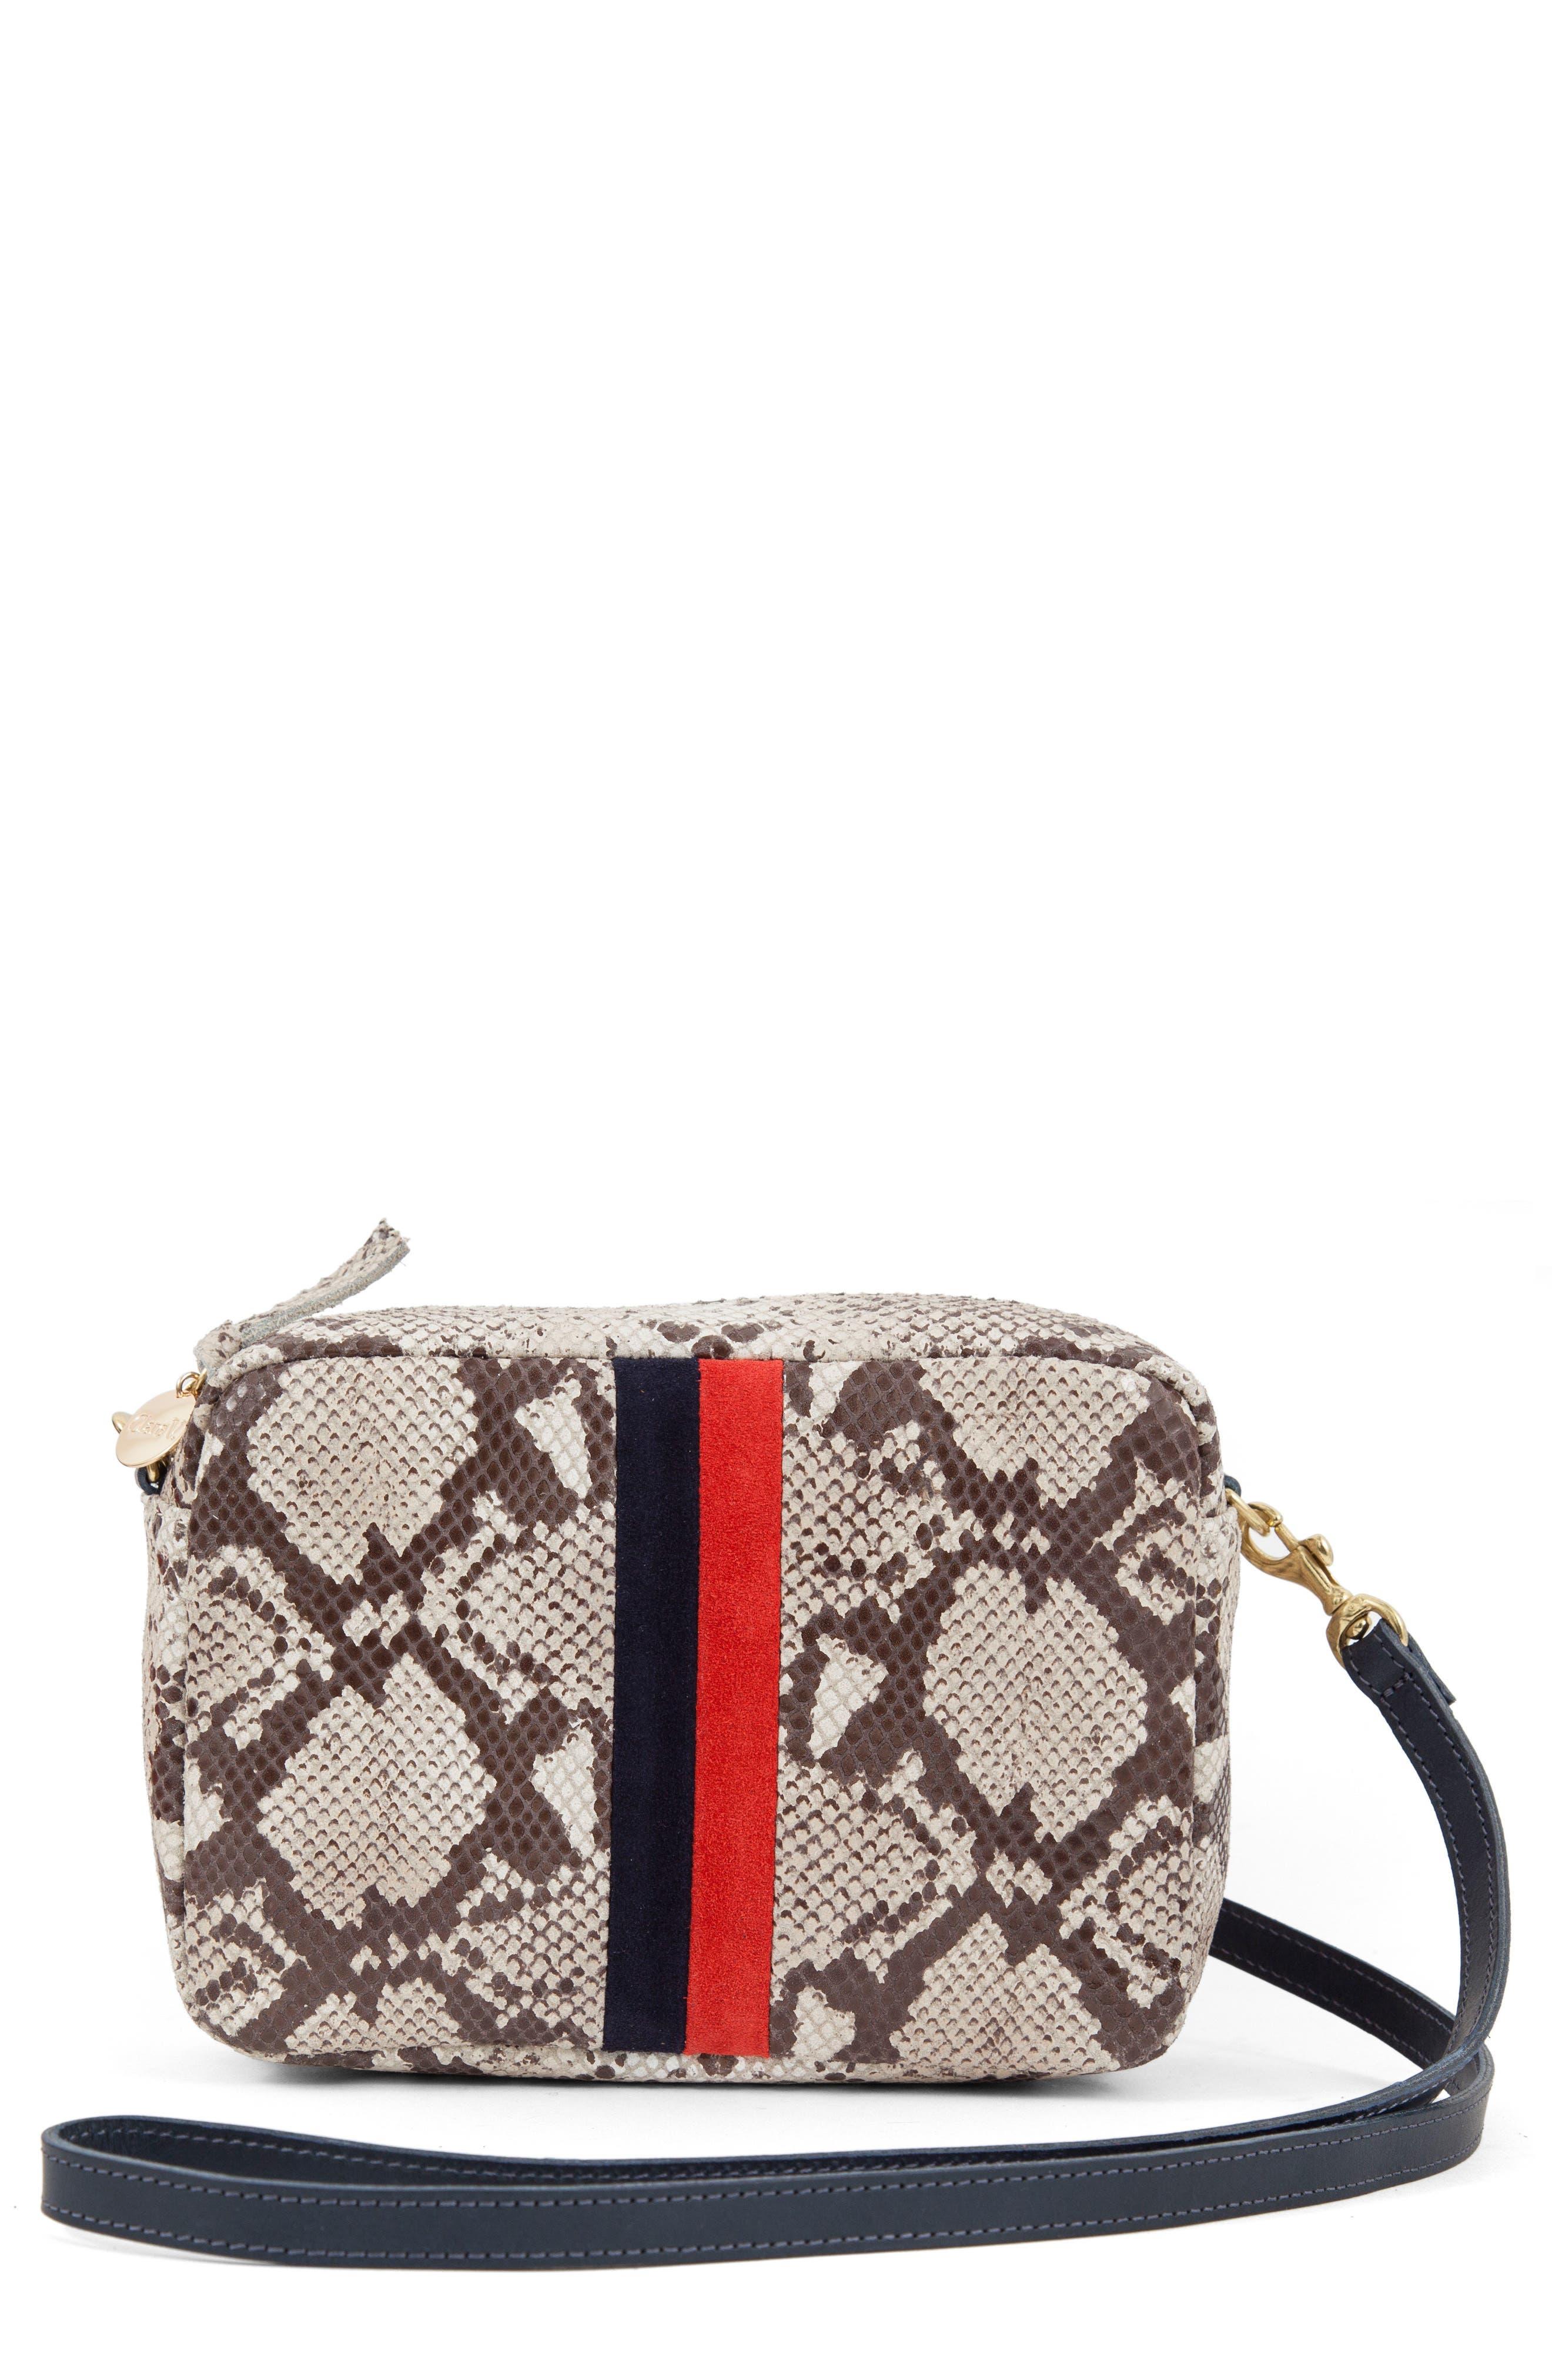 Clare V. Midi Sac Snakeskin Embossed Leather Crossbody Bag